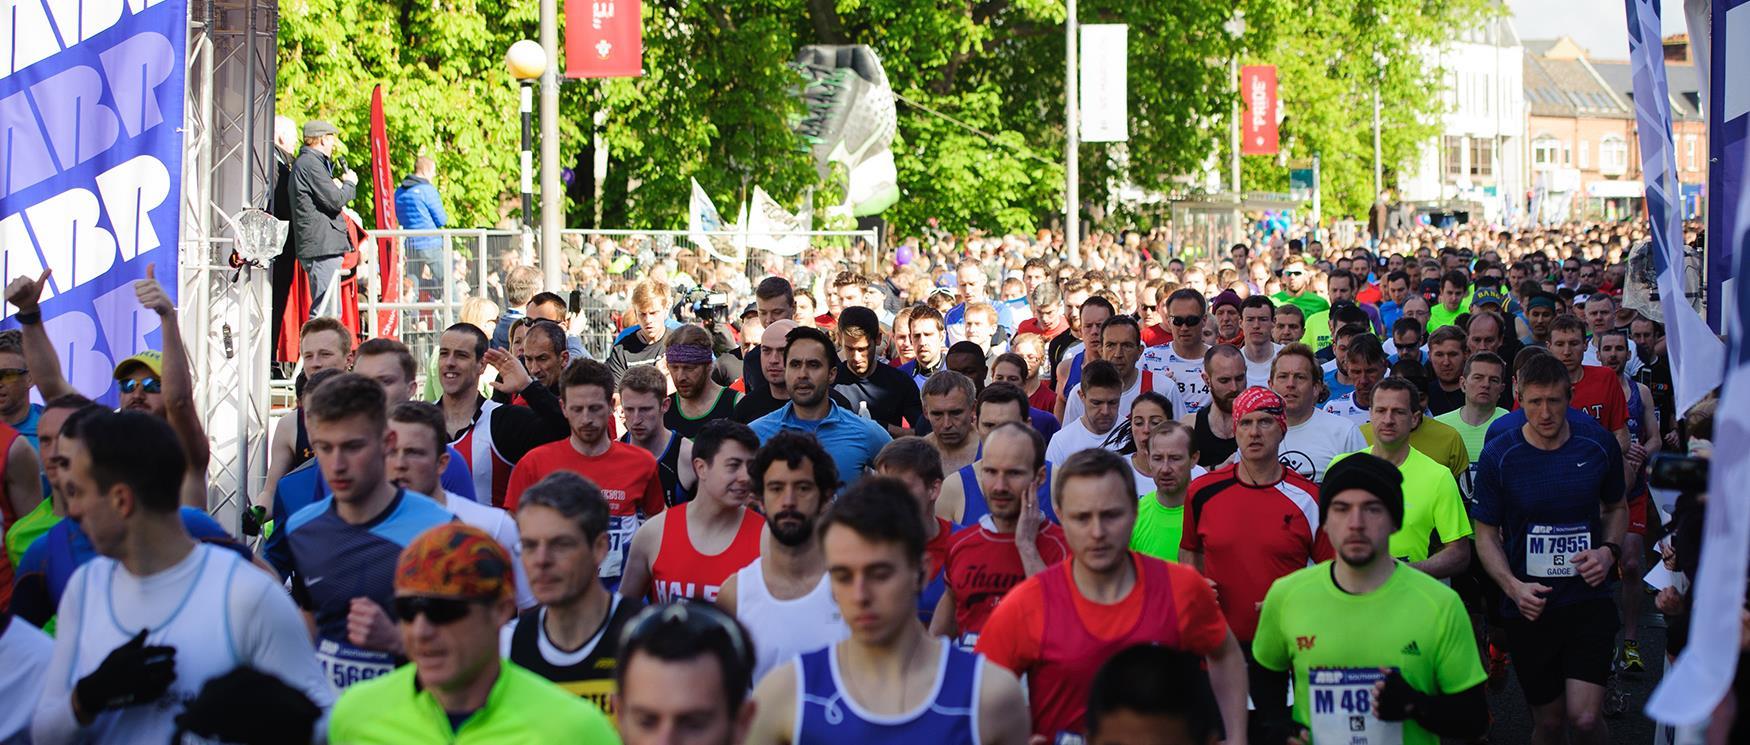 ABP Marathon Event, Southampton